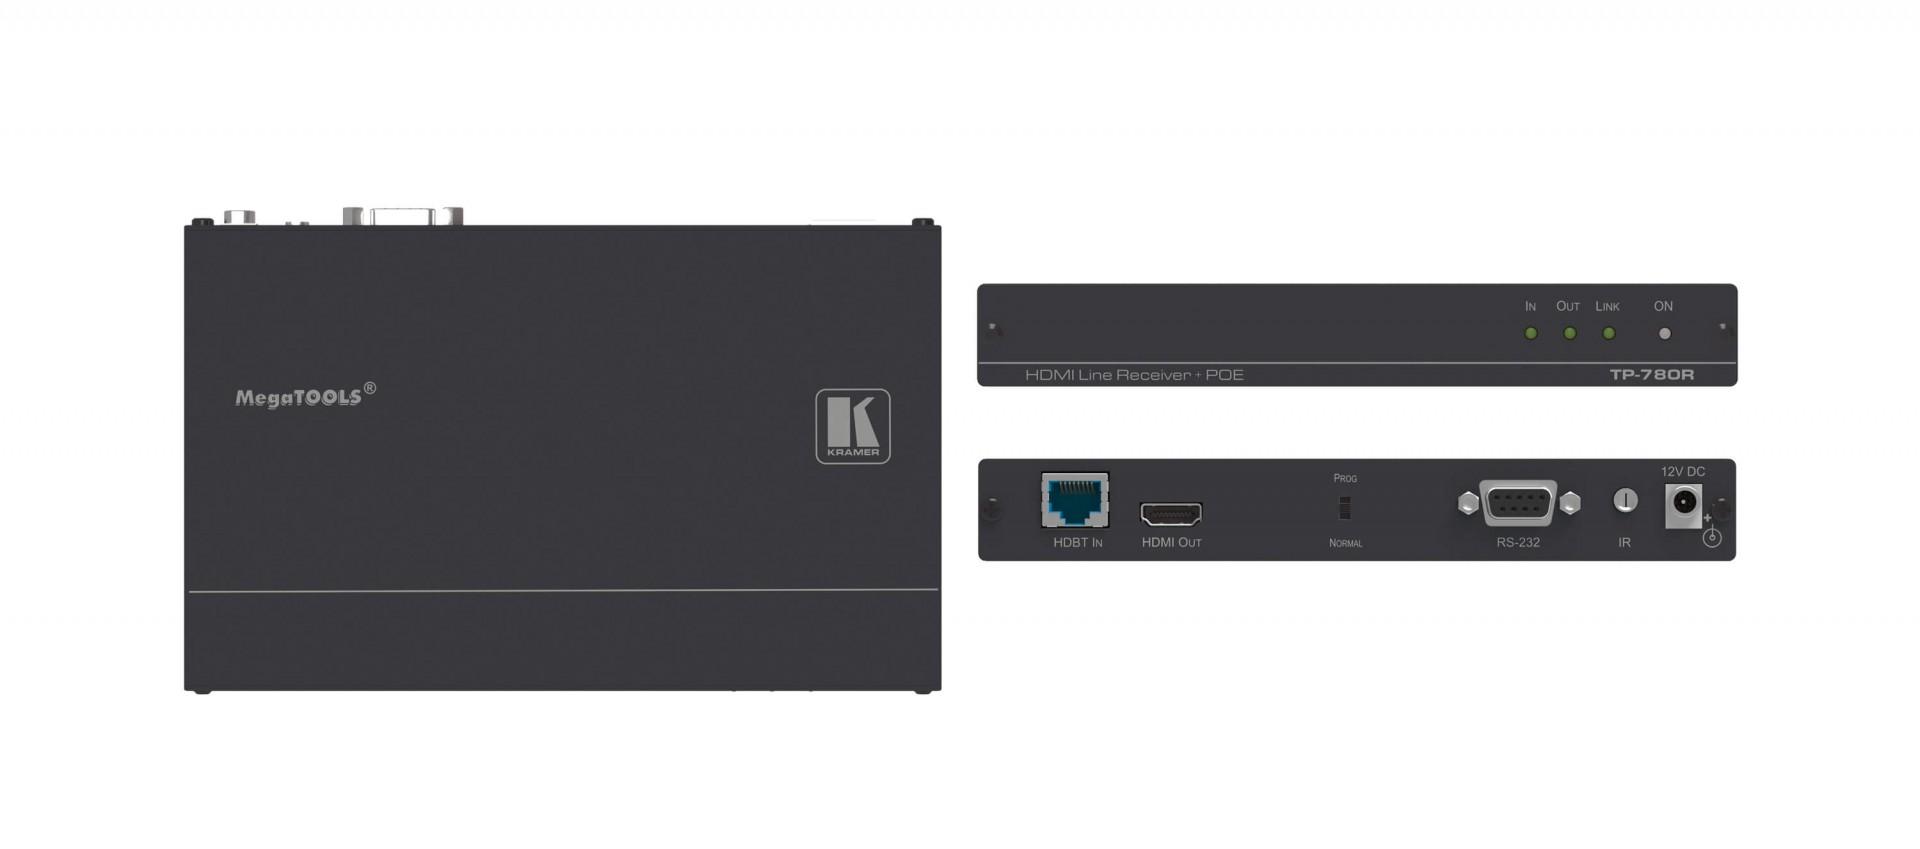 Kramer TP-780R - 4K60 4:2:0 HDMI HDCP 2.2 PoE Receiver